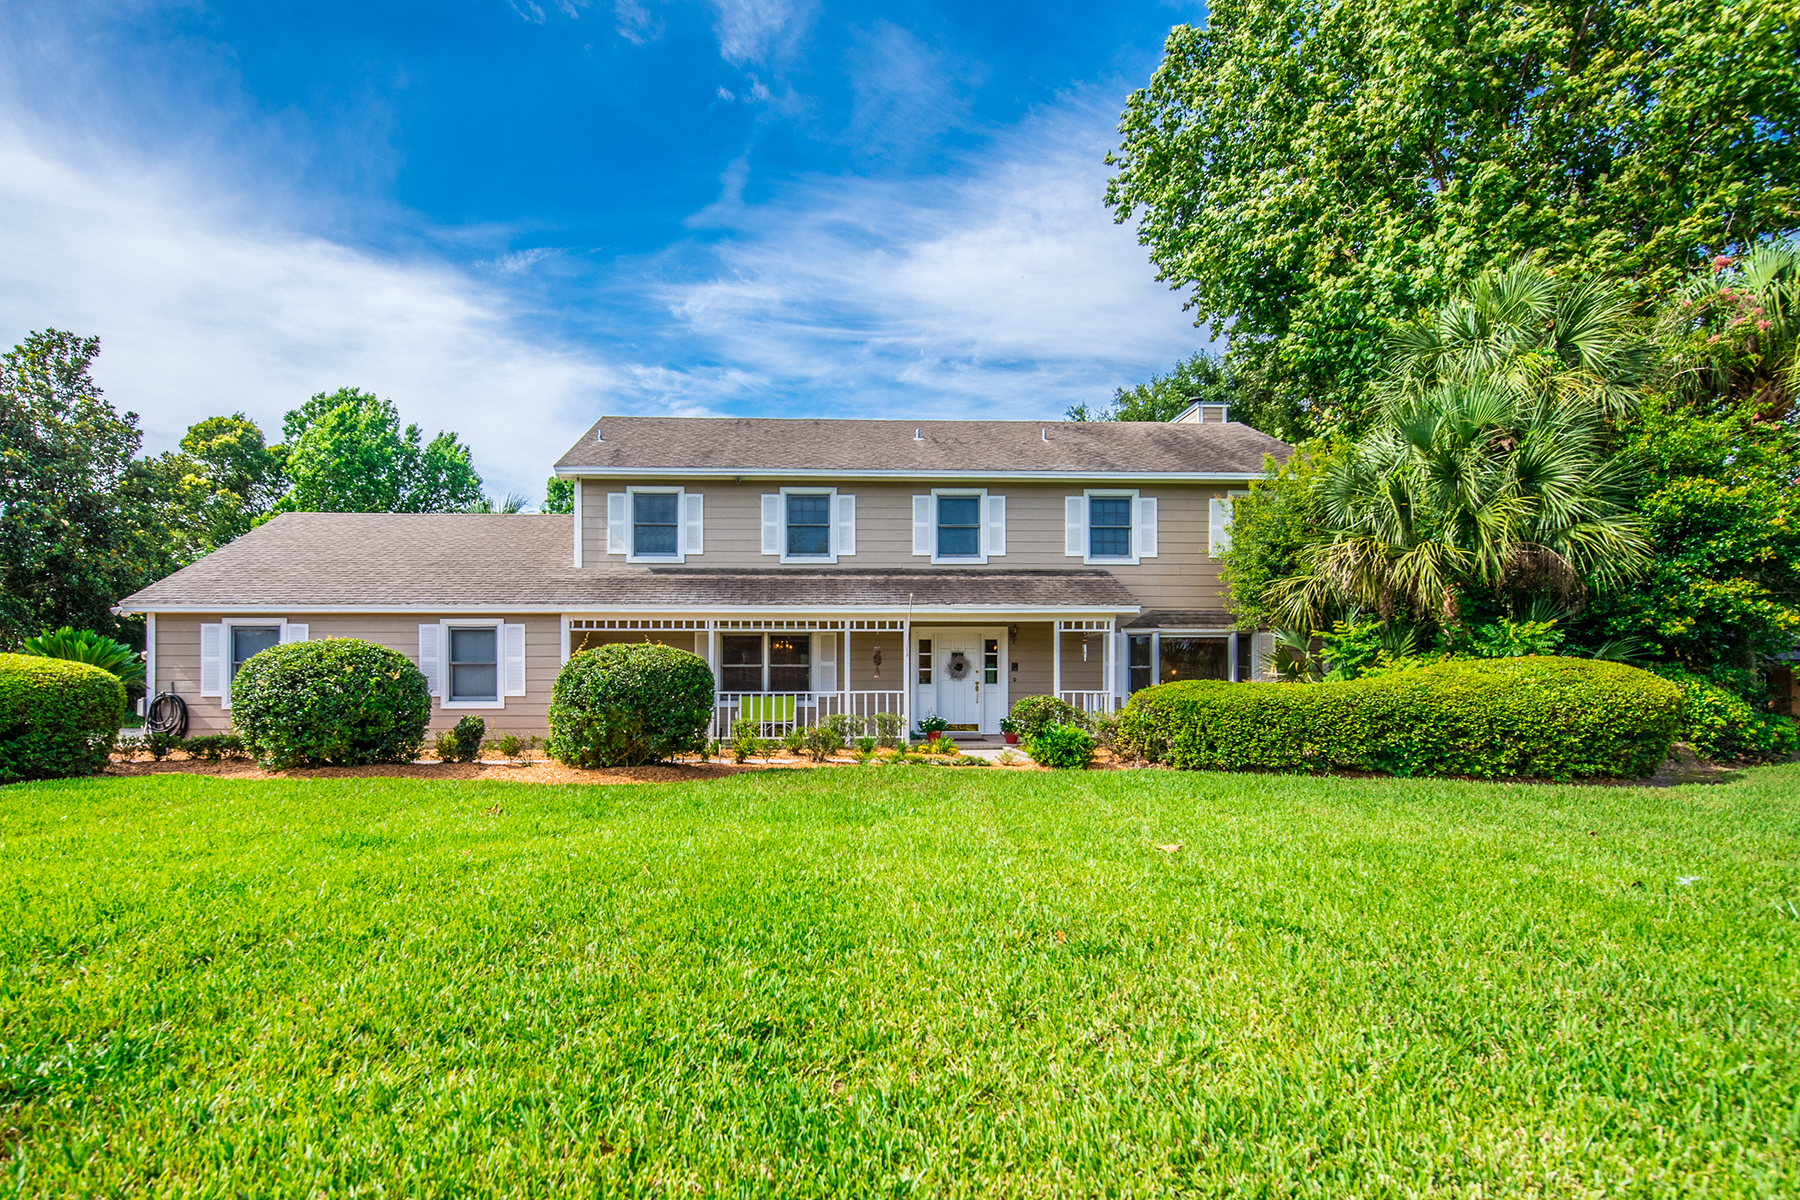 Villa per Vendita alle ore ORLANDO - LONGWOOD 2143 Blue Iris Pl Longwood, Florida, 32779 Stati Uniti